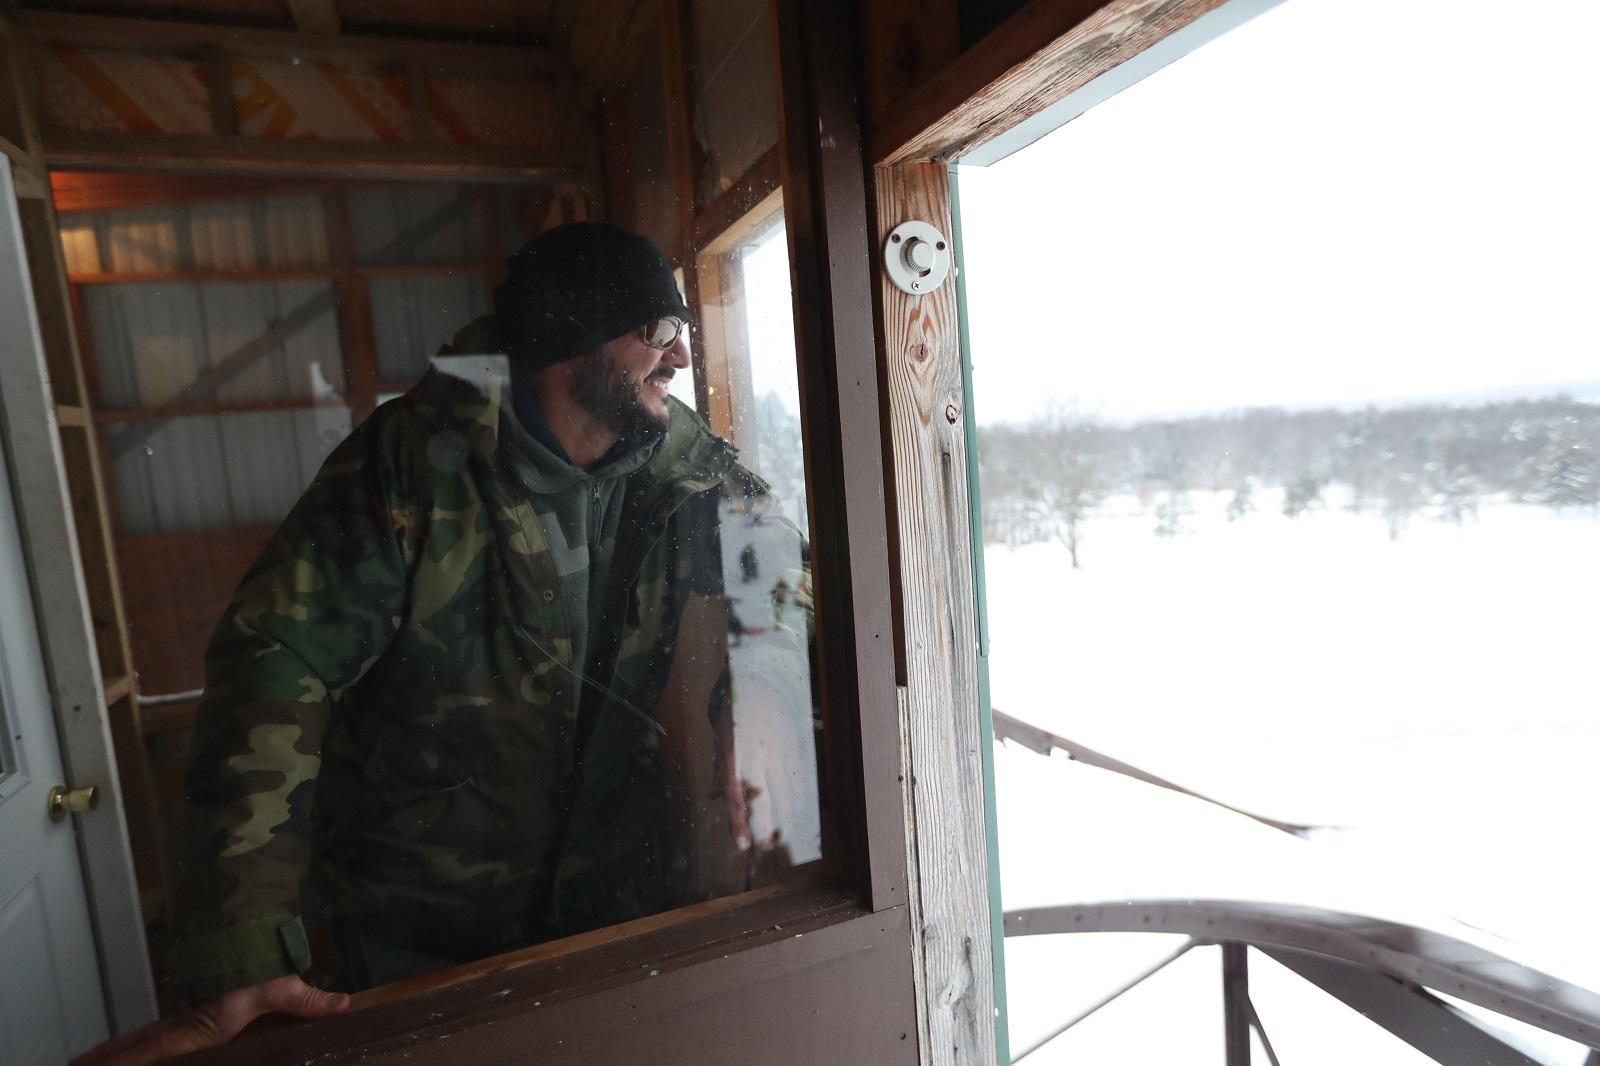 100 Things: Go tobogganing at Chestnut Ridge – The Buffalo News